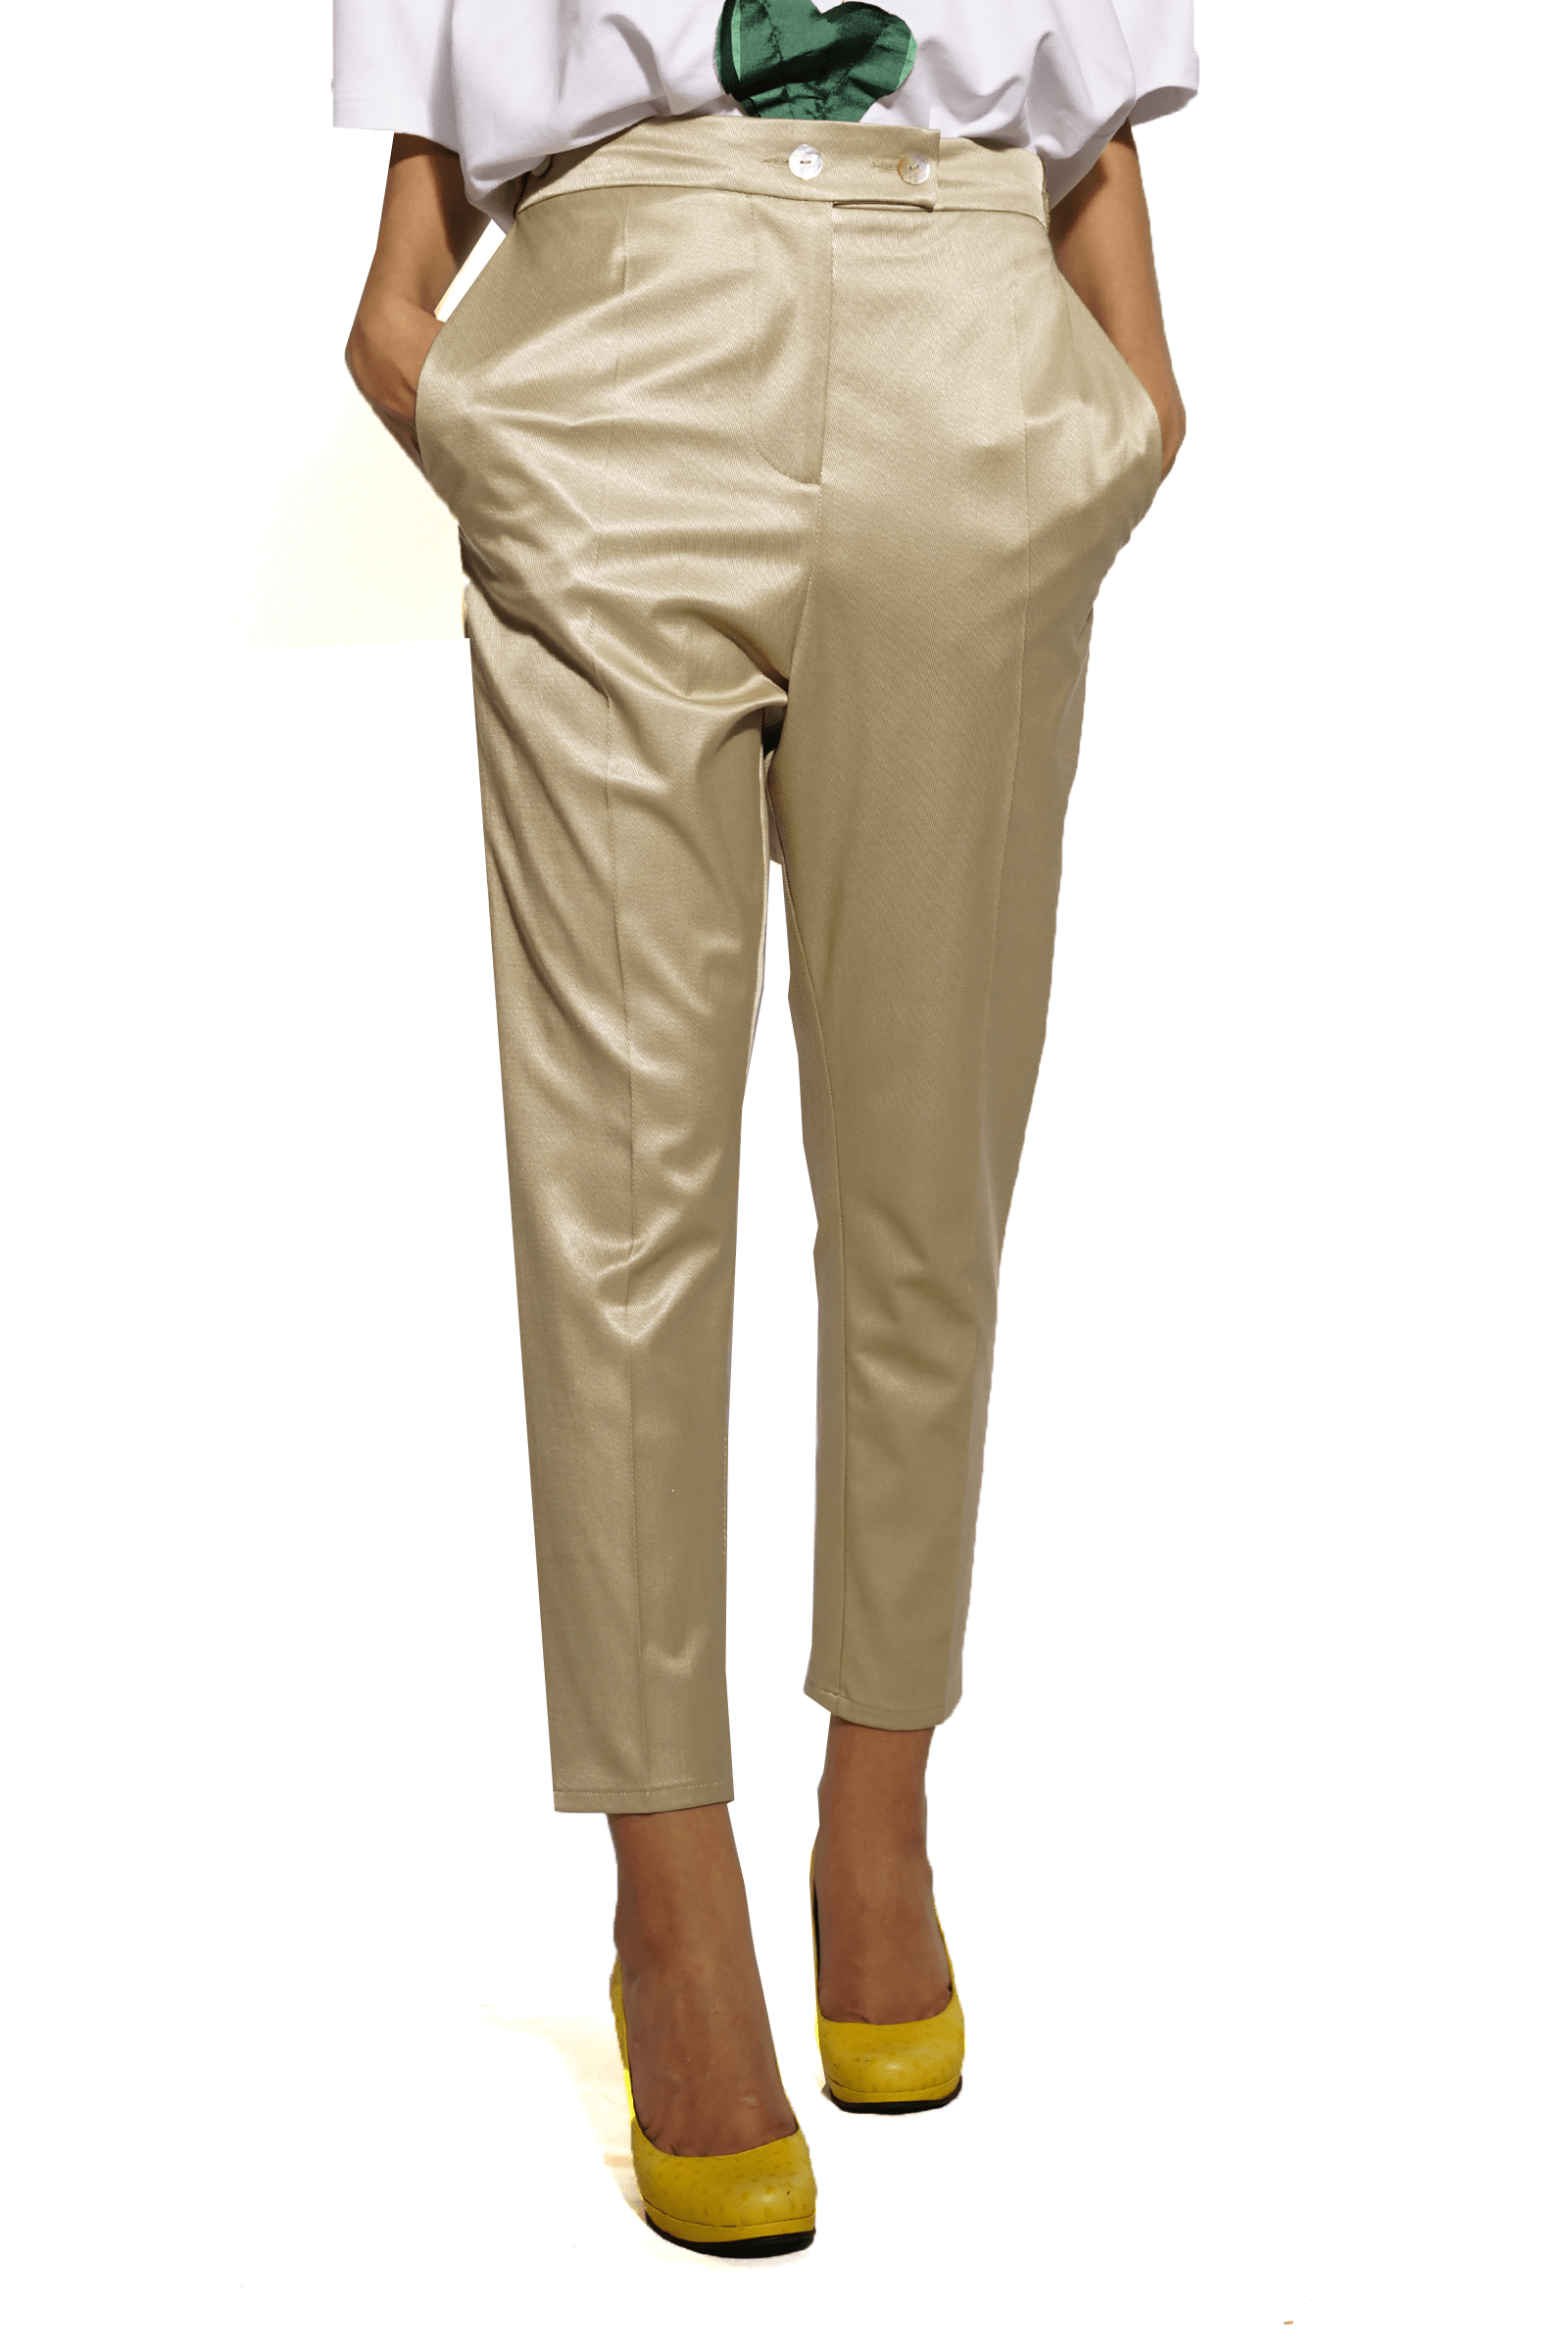 Satin beige pants